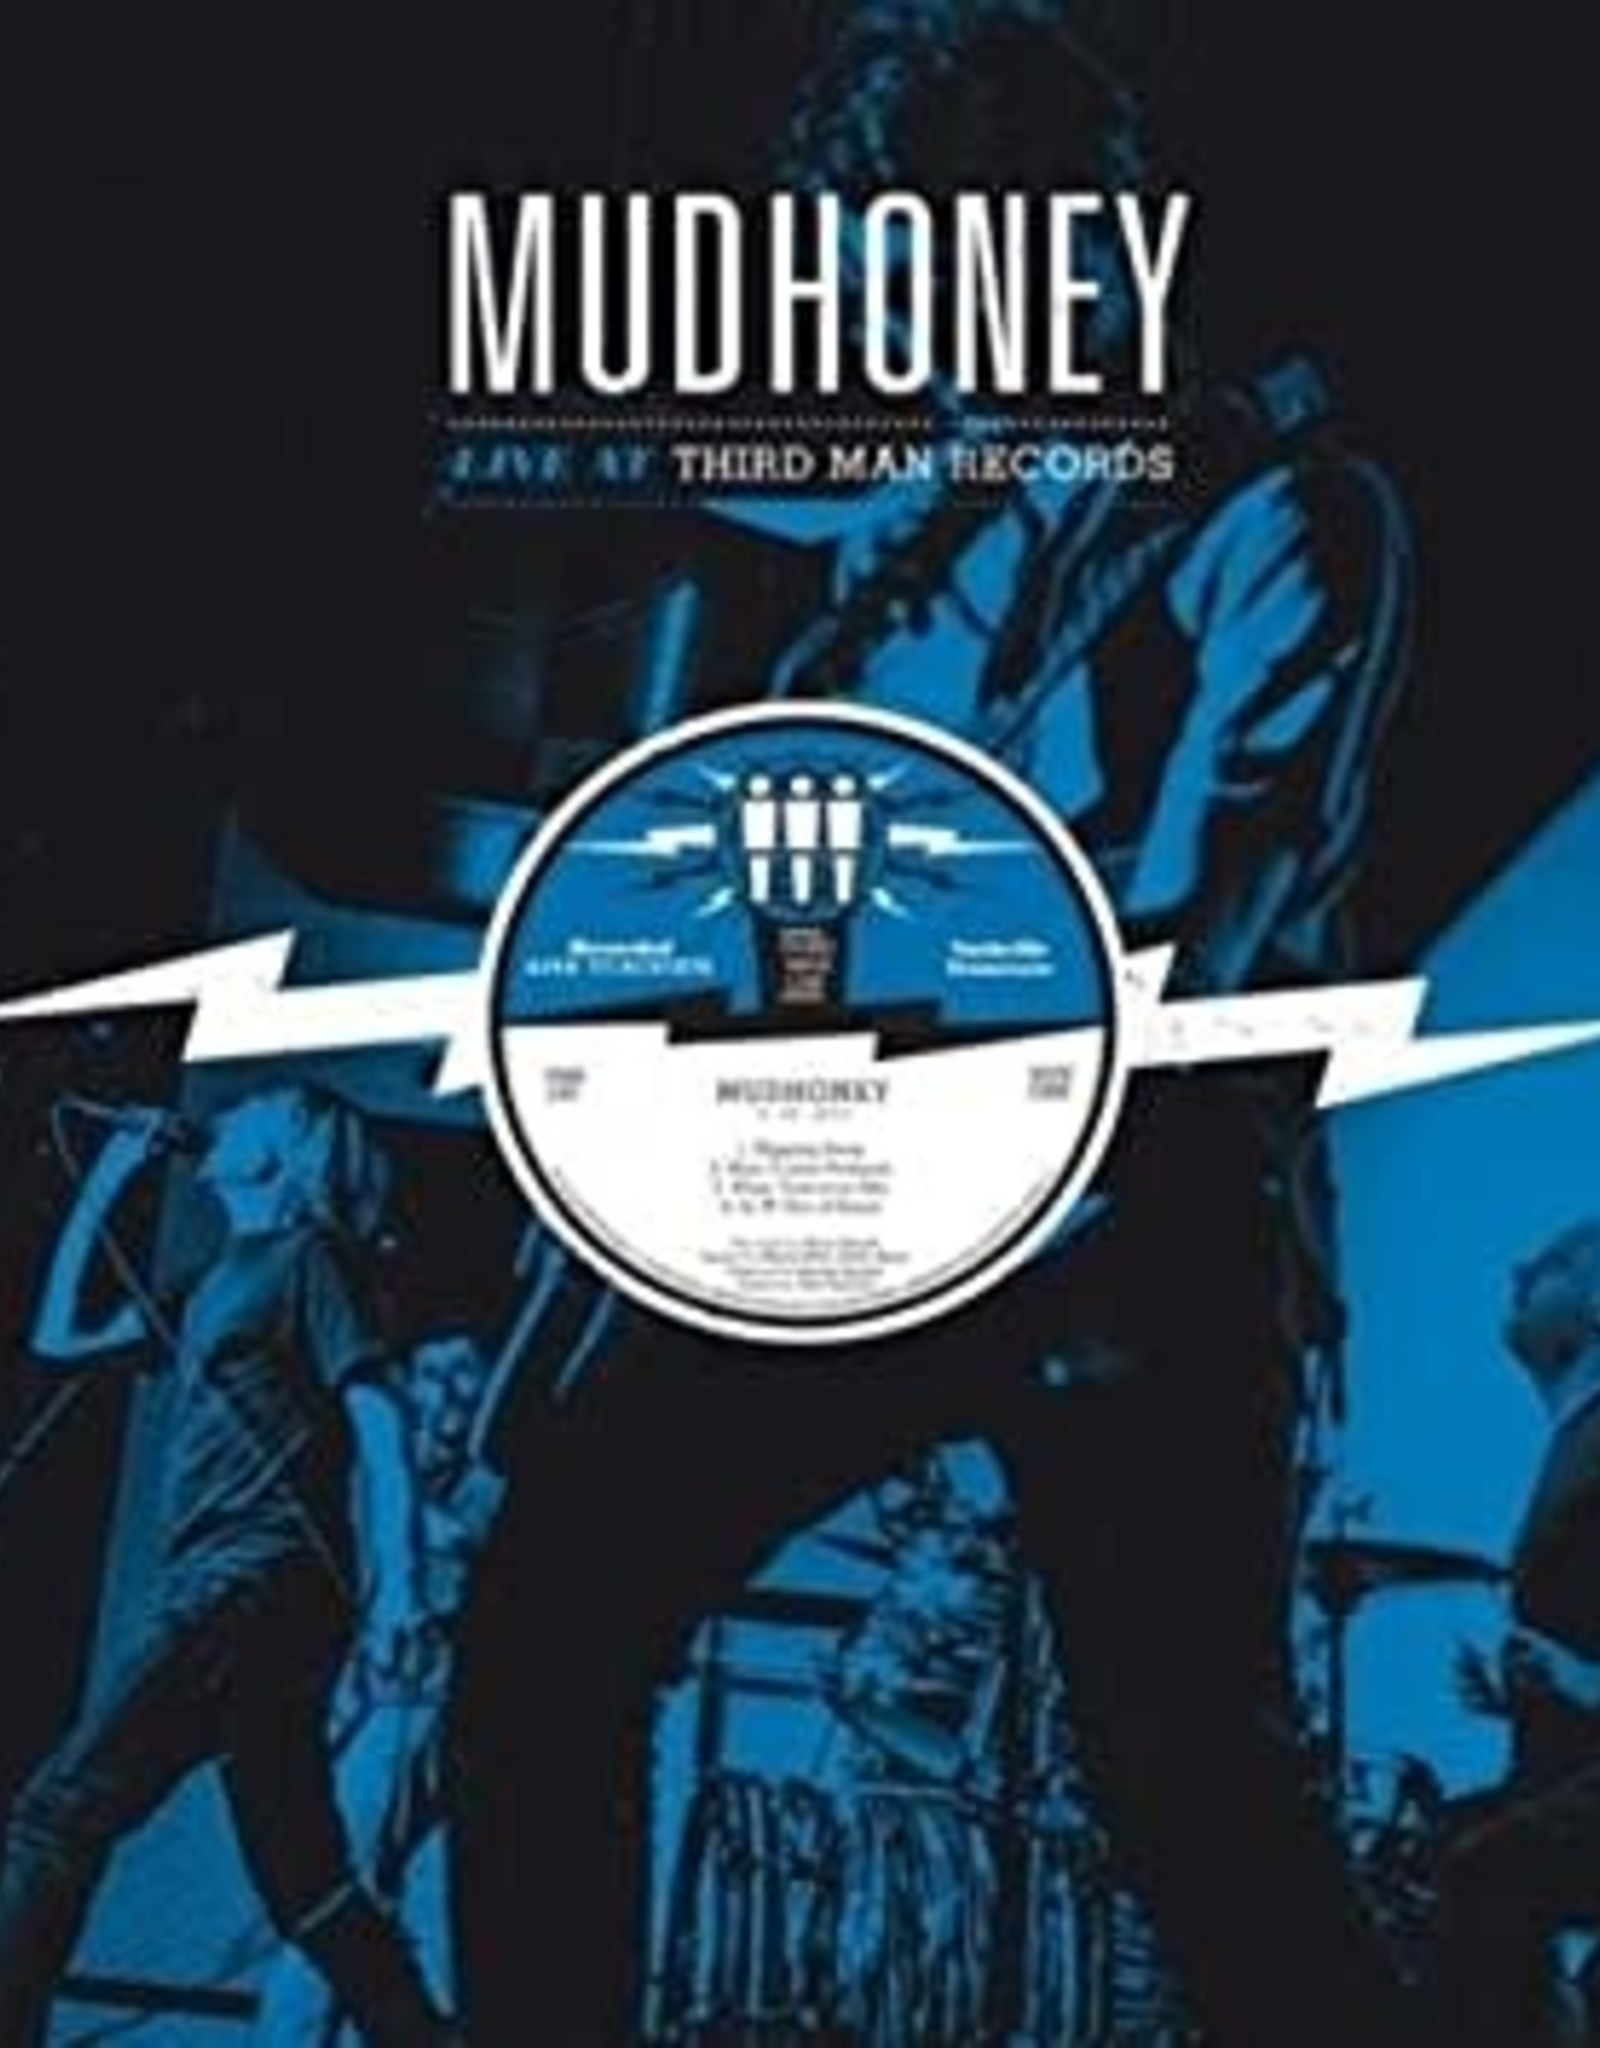 "Mudhoney - Live At Third Man Records (12"" Vinyl)"